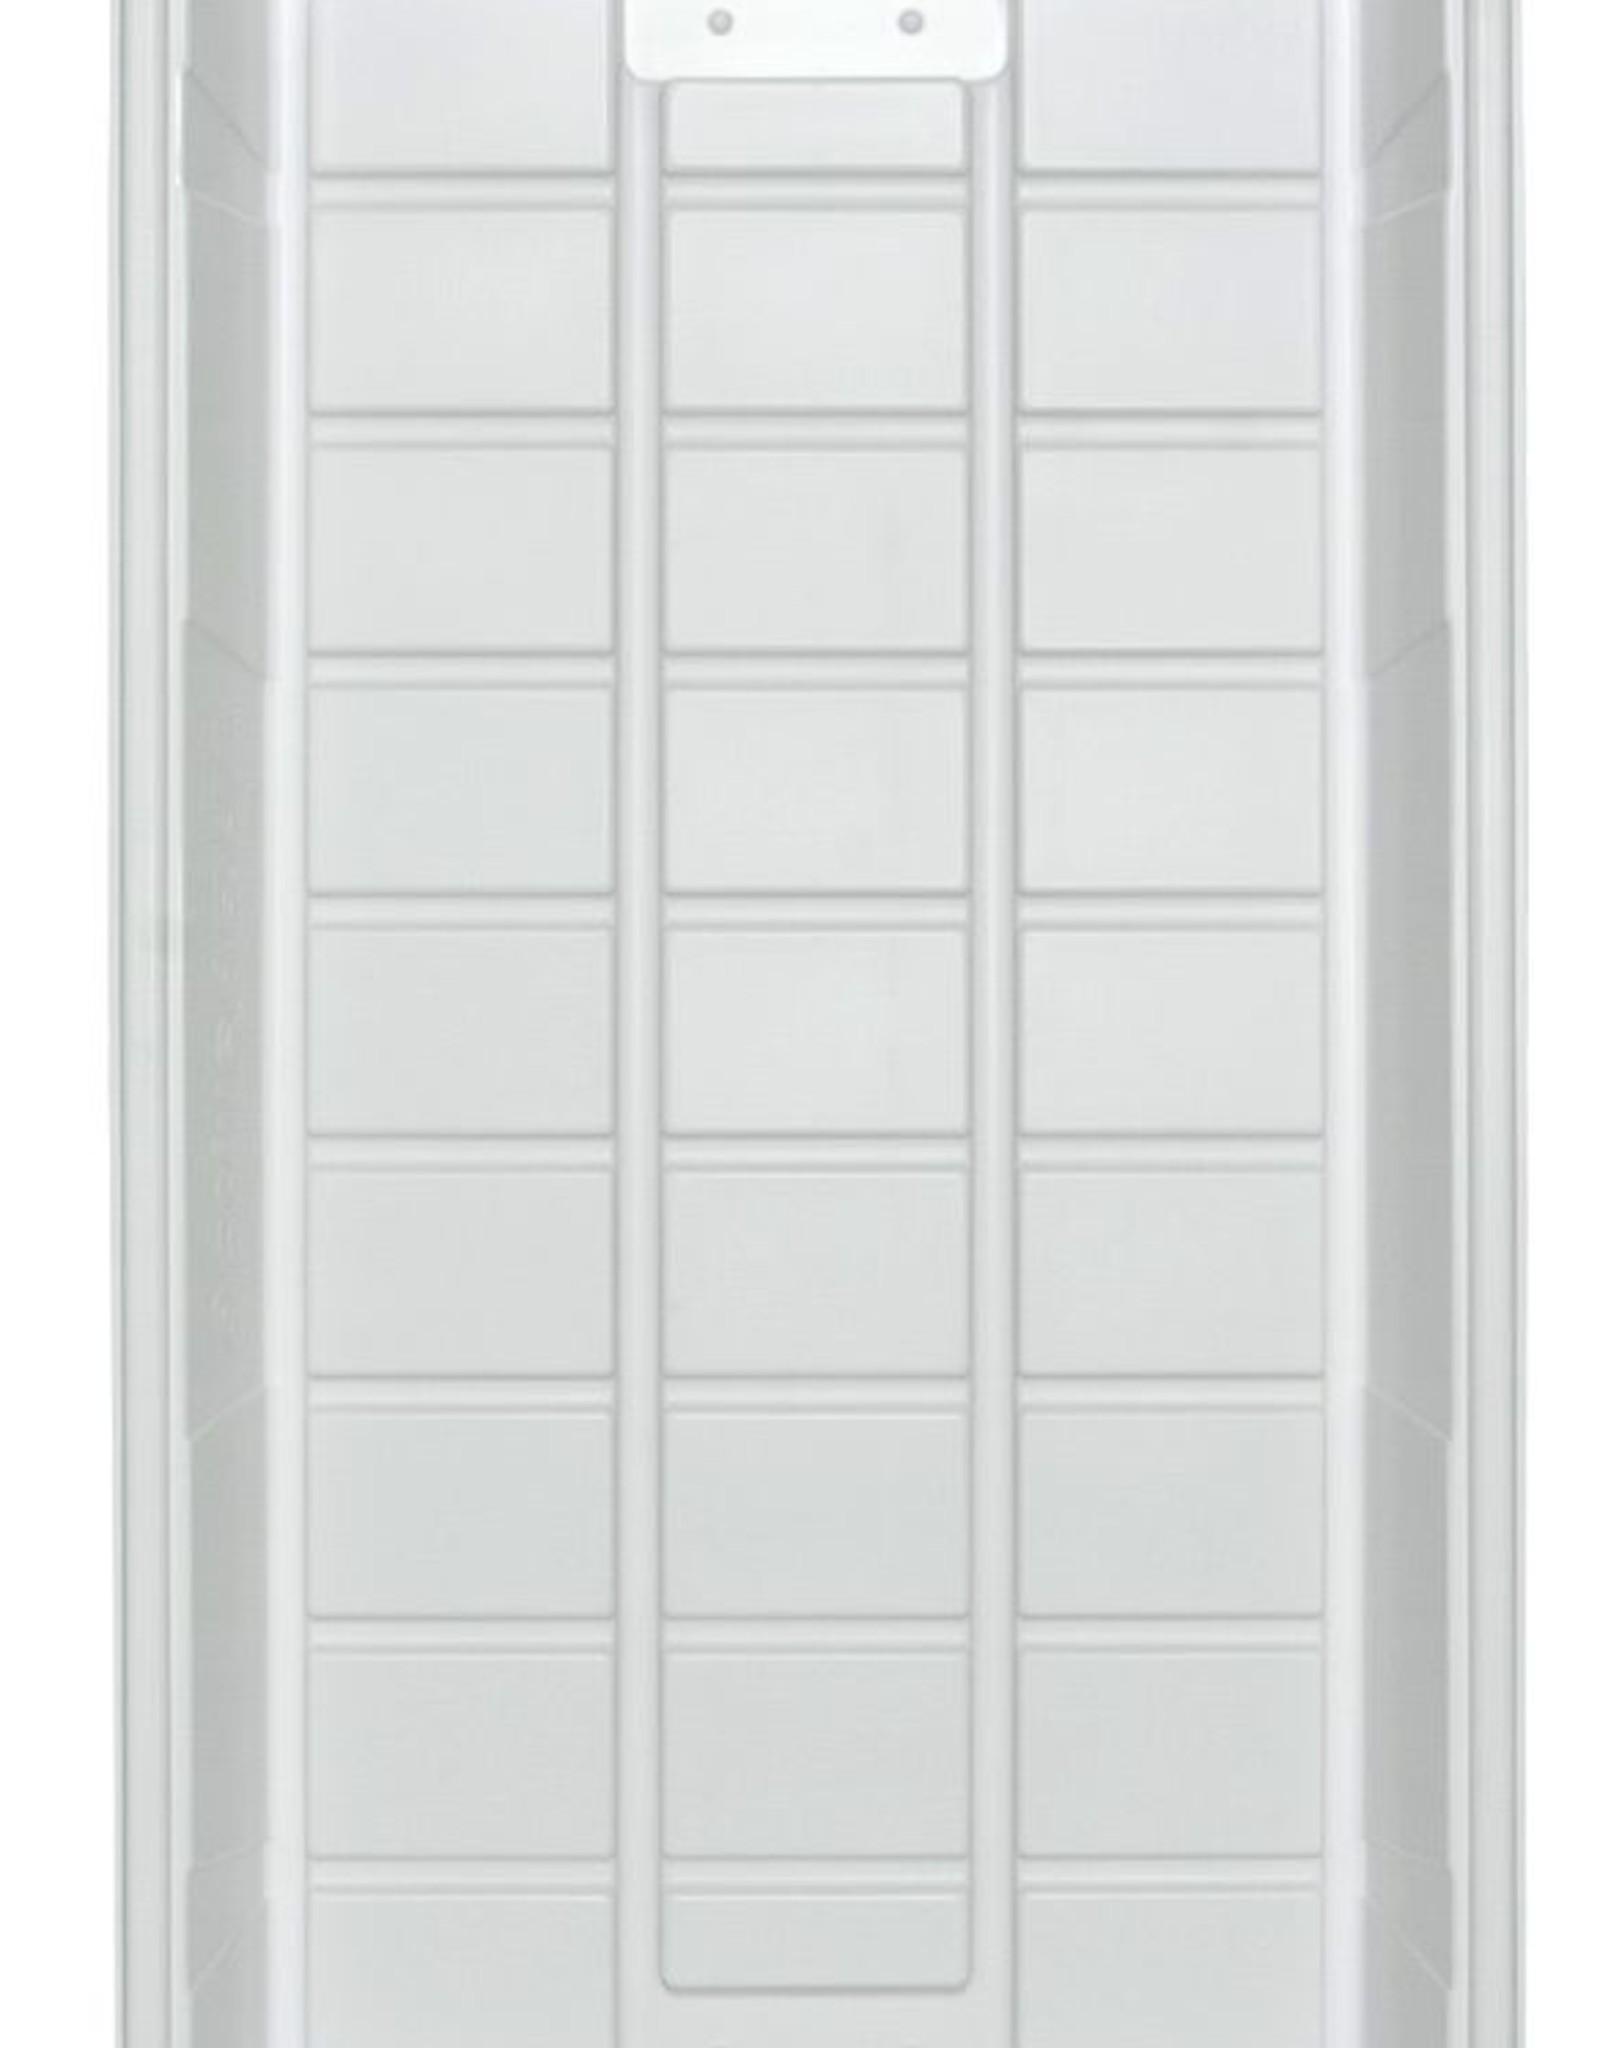 Active Aqua Premium White Flood Table, 2' x 4'